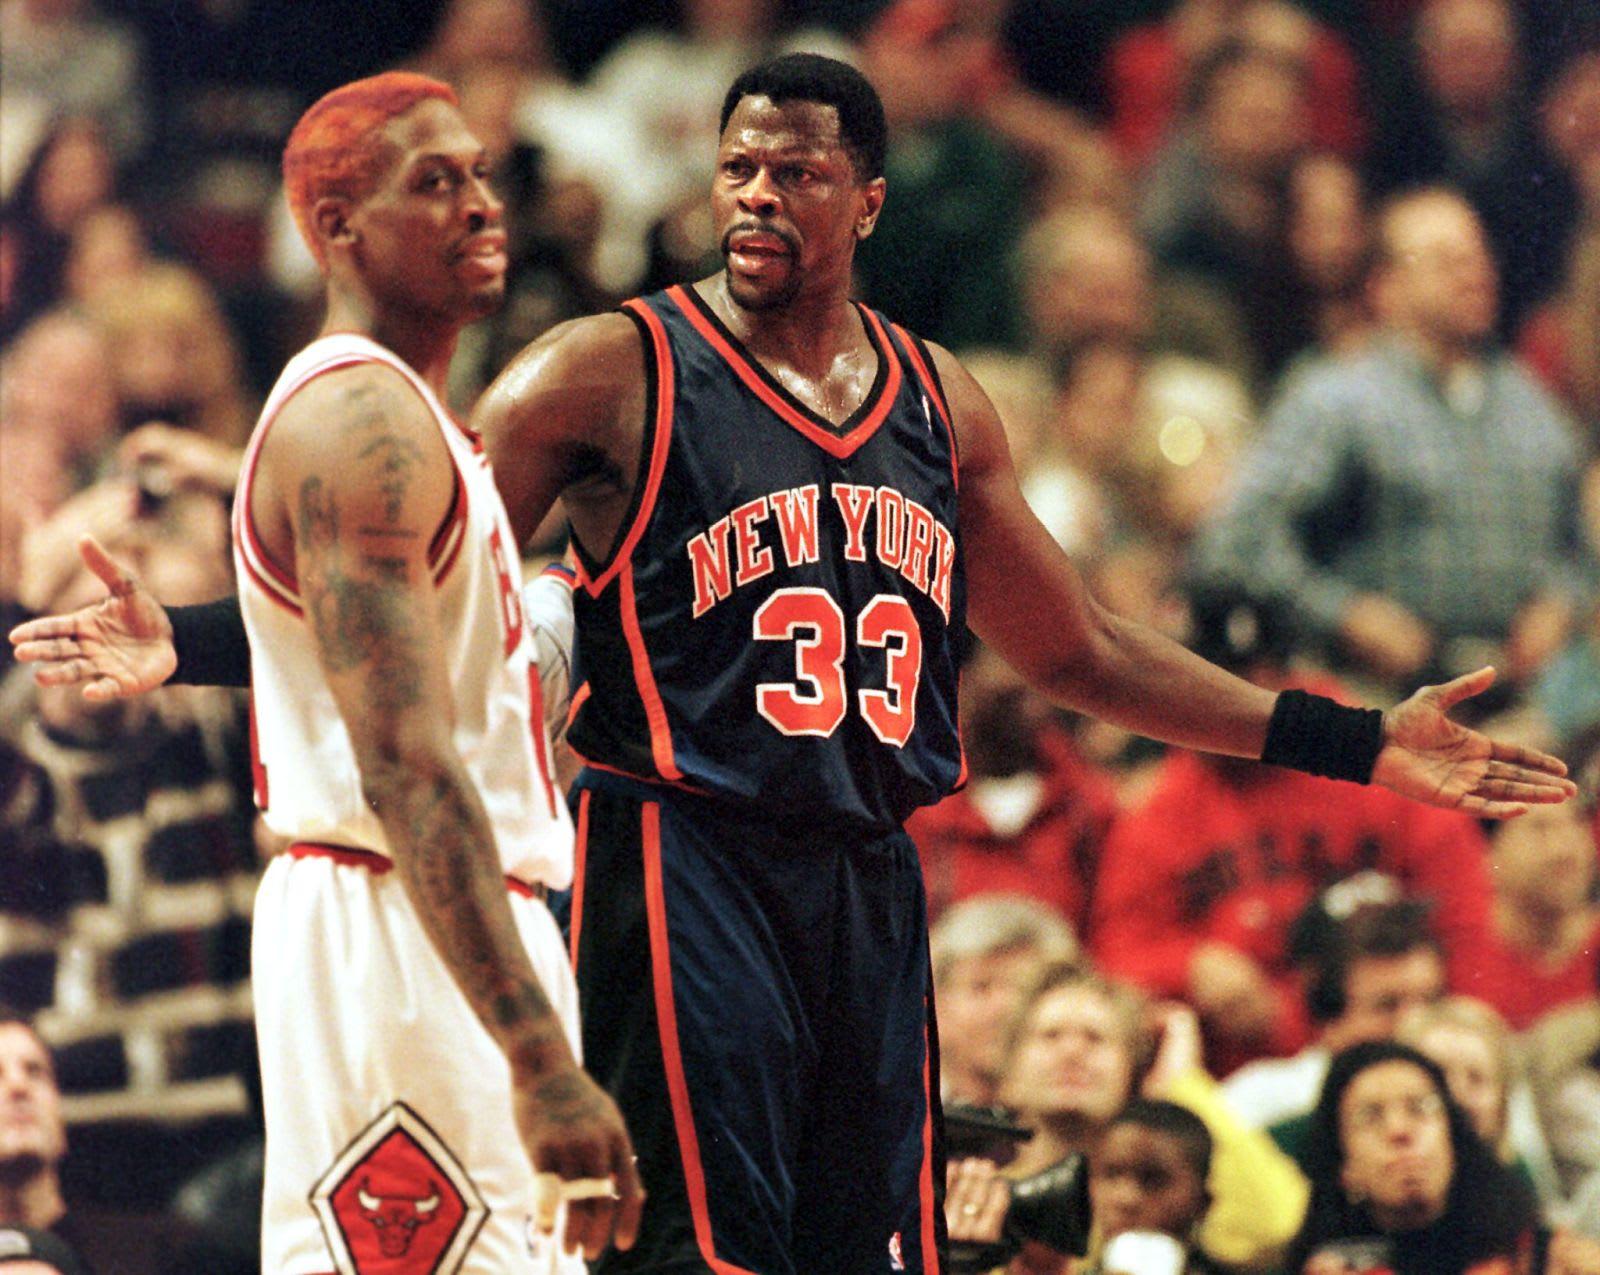 Chicago Bulls 3 Biggest Rivals From The Last Dance 1997 98 Season